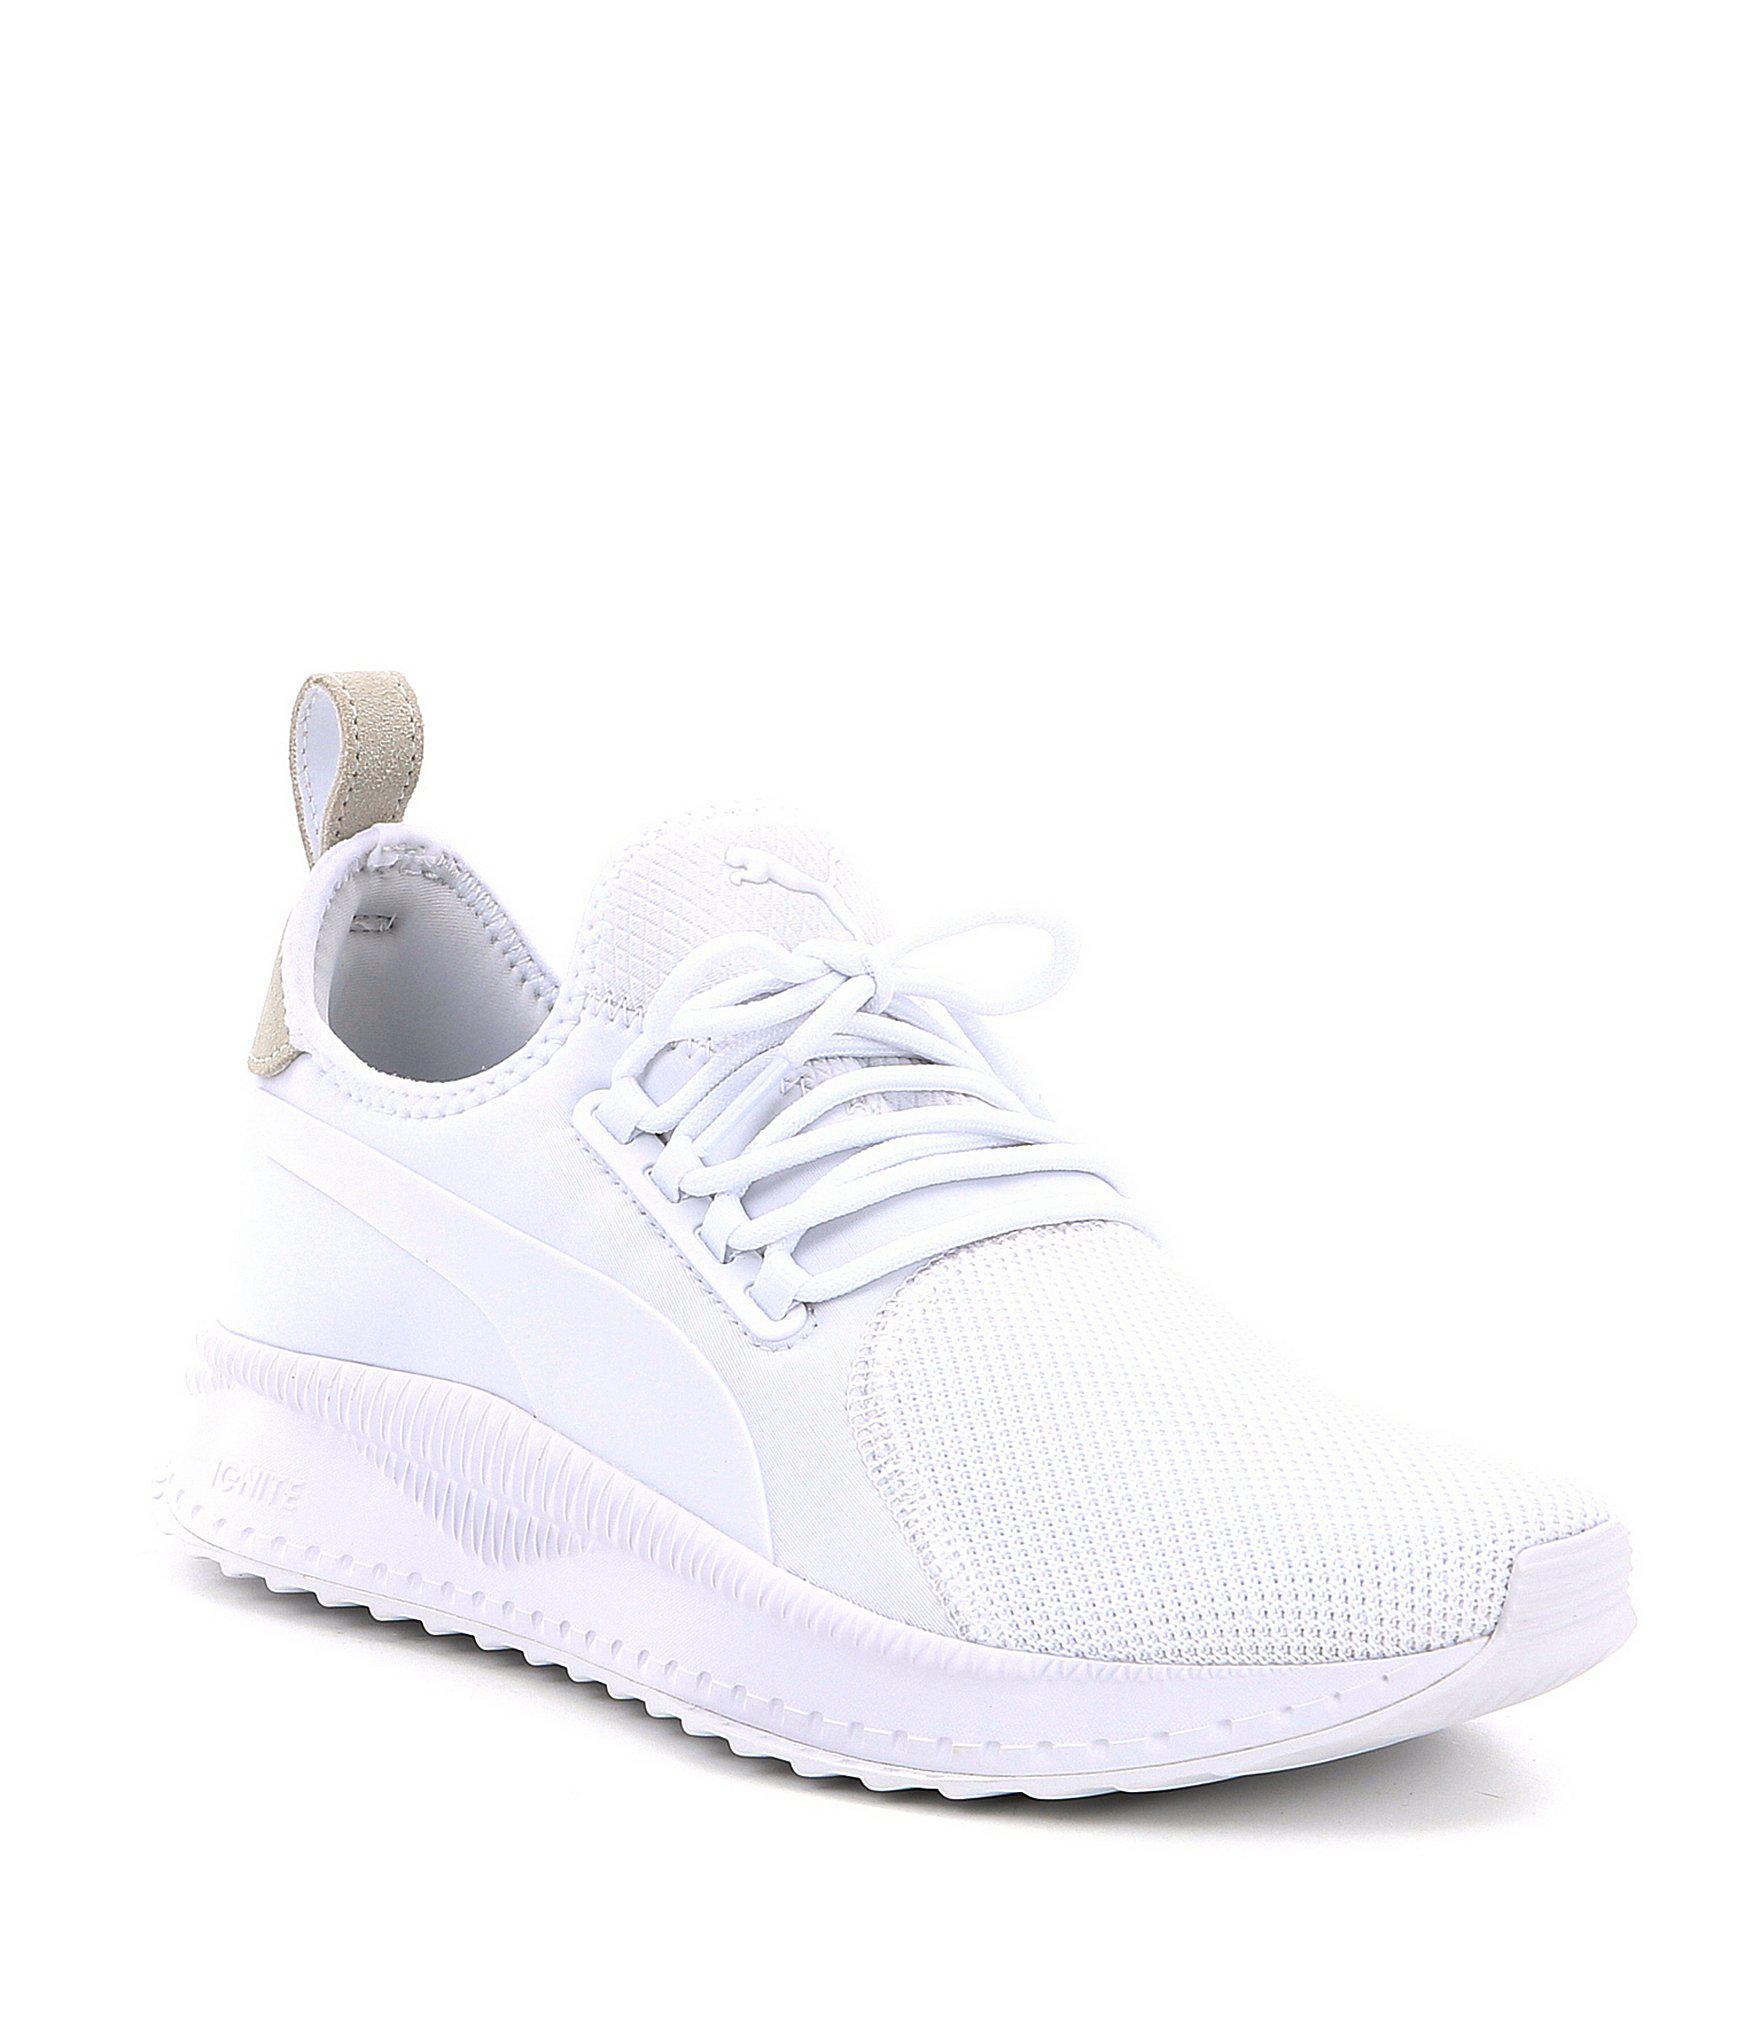 d8b0bfb2e7d ... Puma Tsugi Apex Sneakers in Blue for Men - Lyst best deals on 5475c  7419e ...